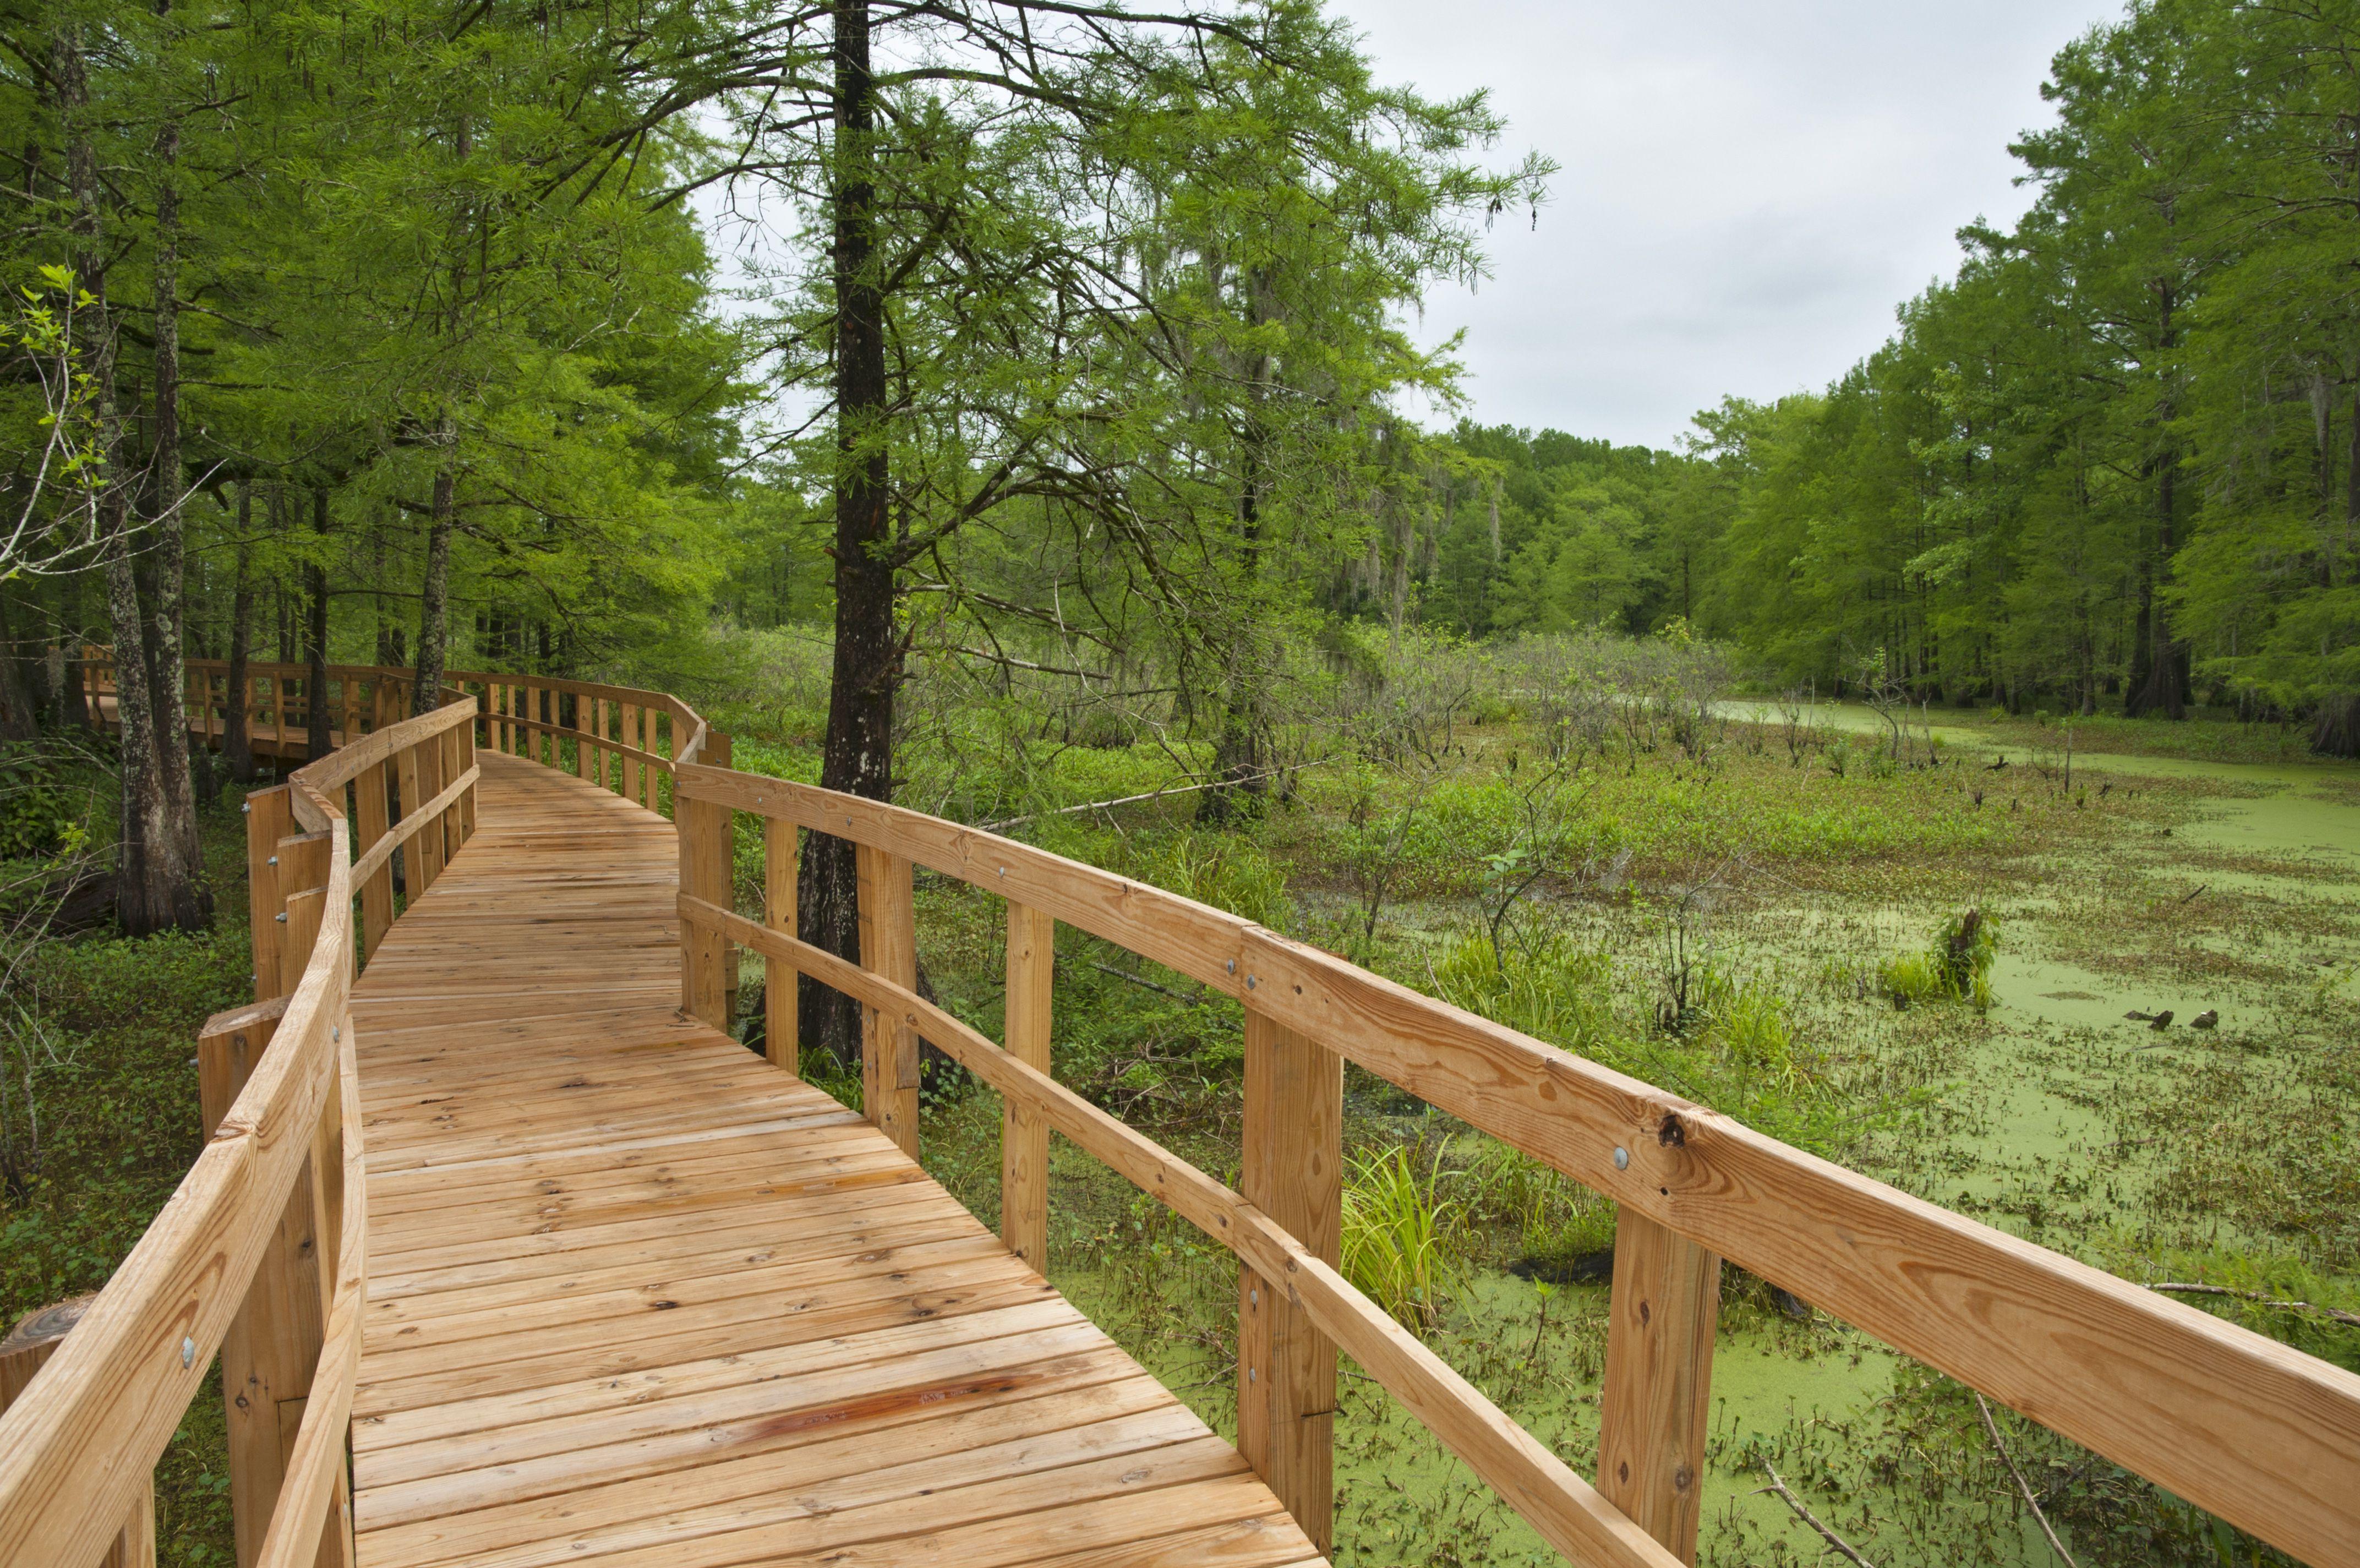 Wooden walkway into wetland at Lake Martin Cypress Island Preserve.